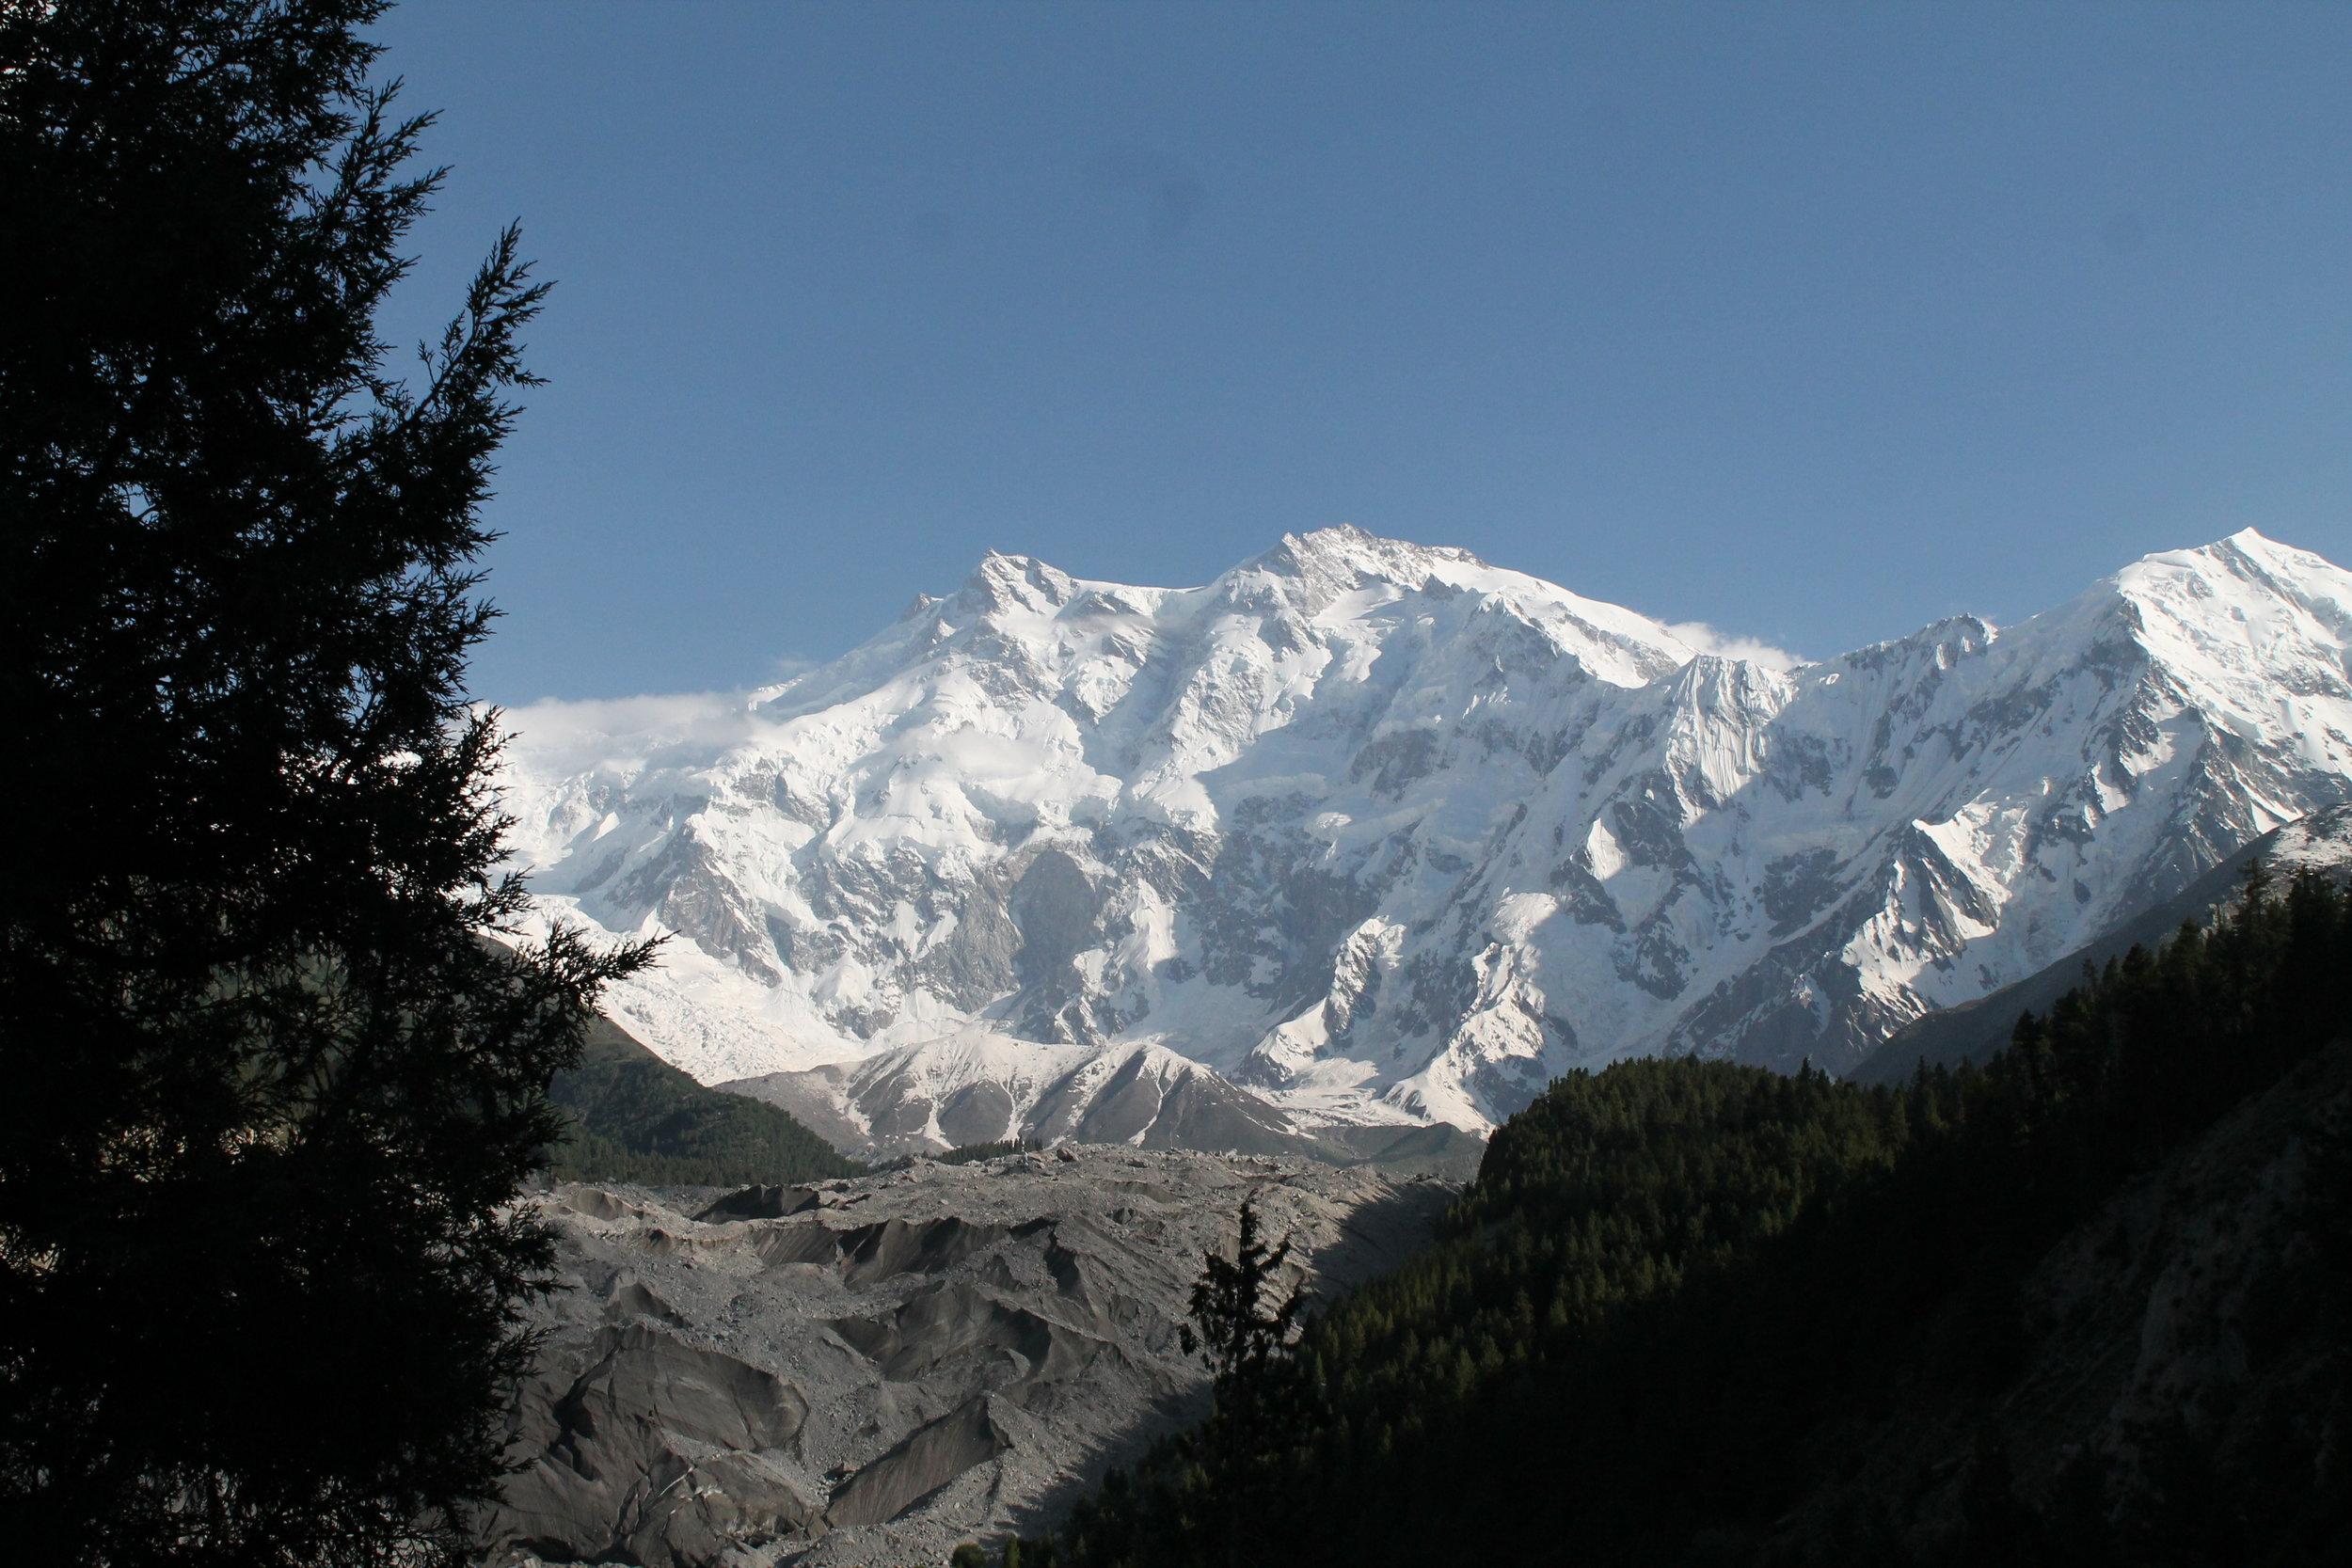 The daunting white peak of Nanga Parbat